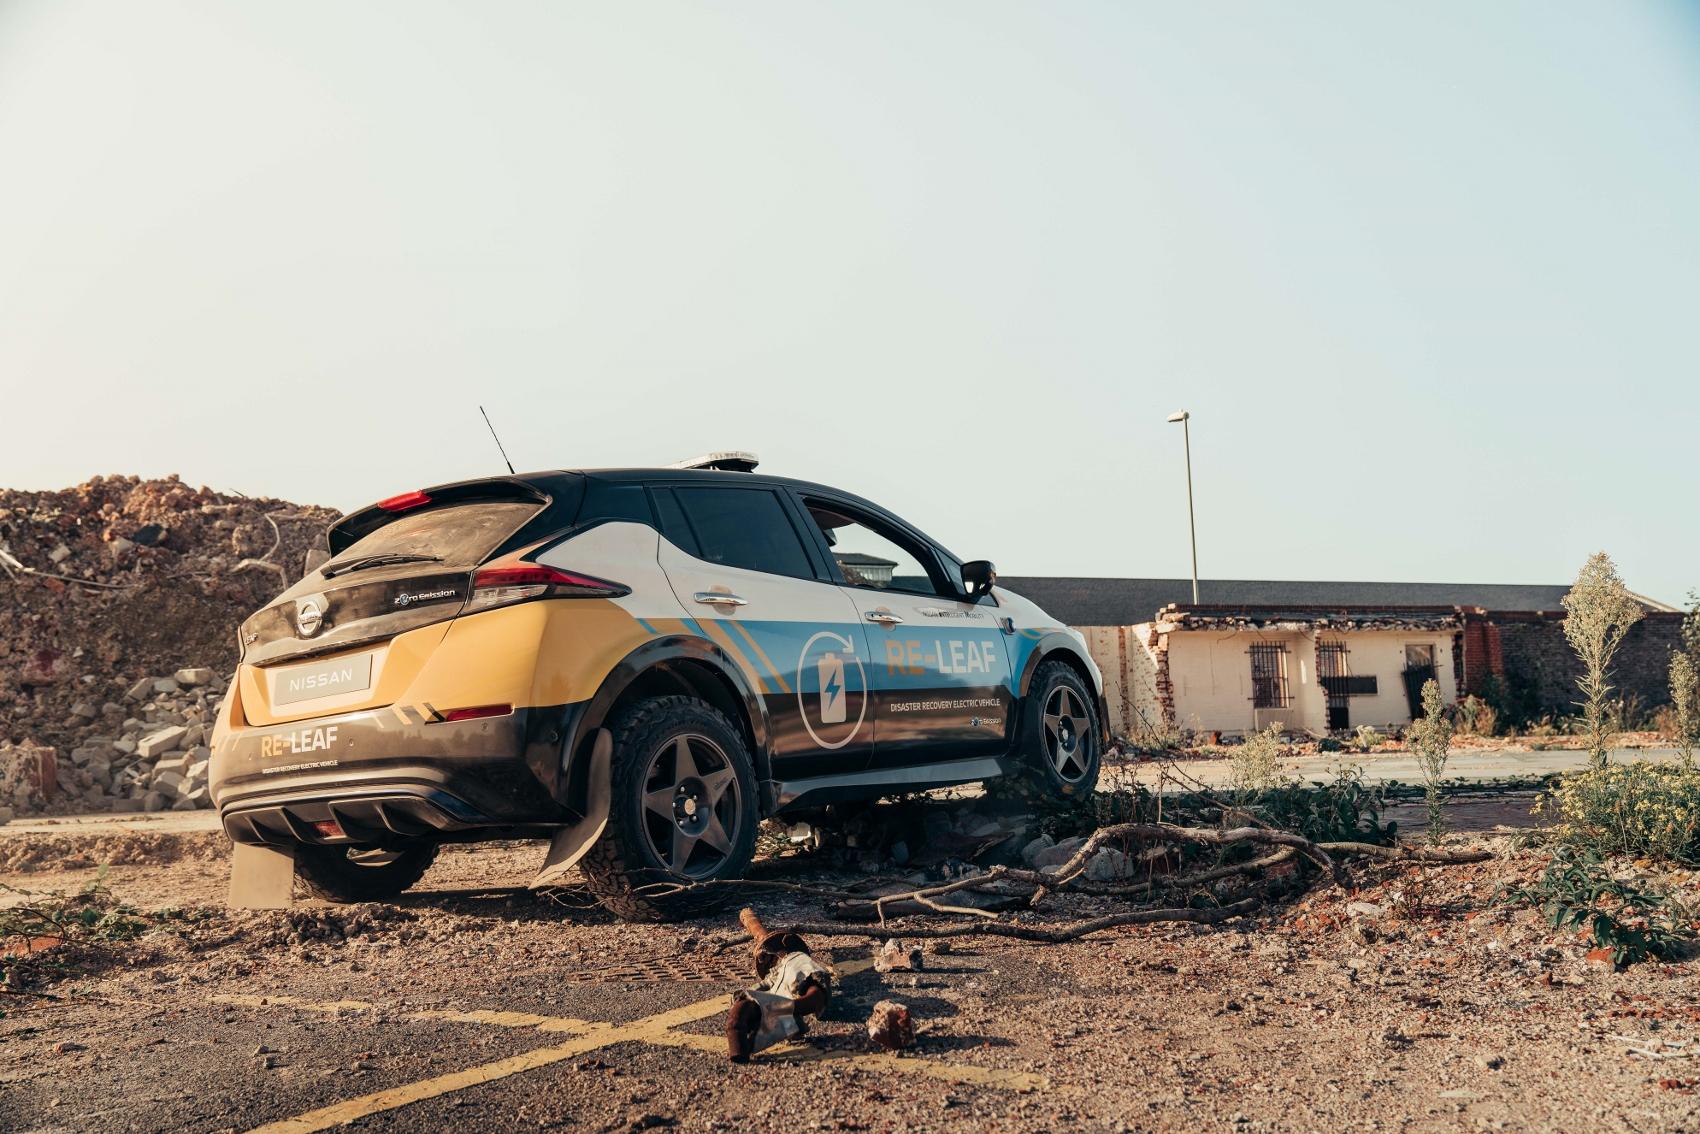 Nissan RE-Leaf je určený na zásahy po katastrofách kOuztJHKFI nissanre-leaf8-1700x1134